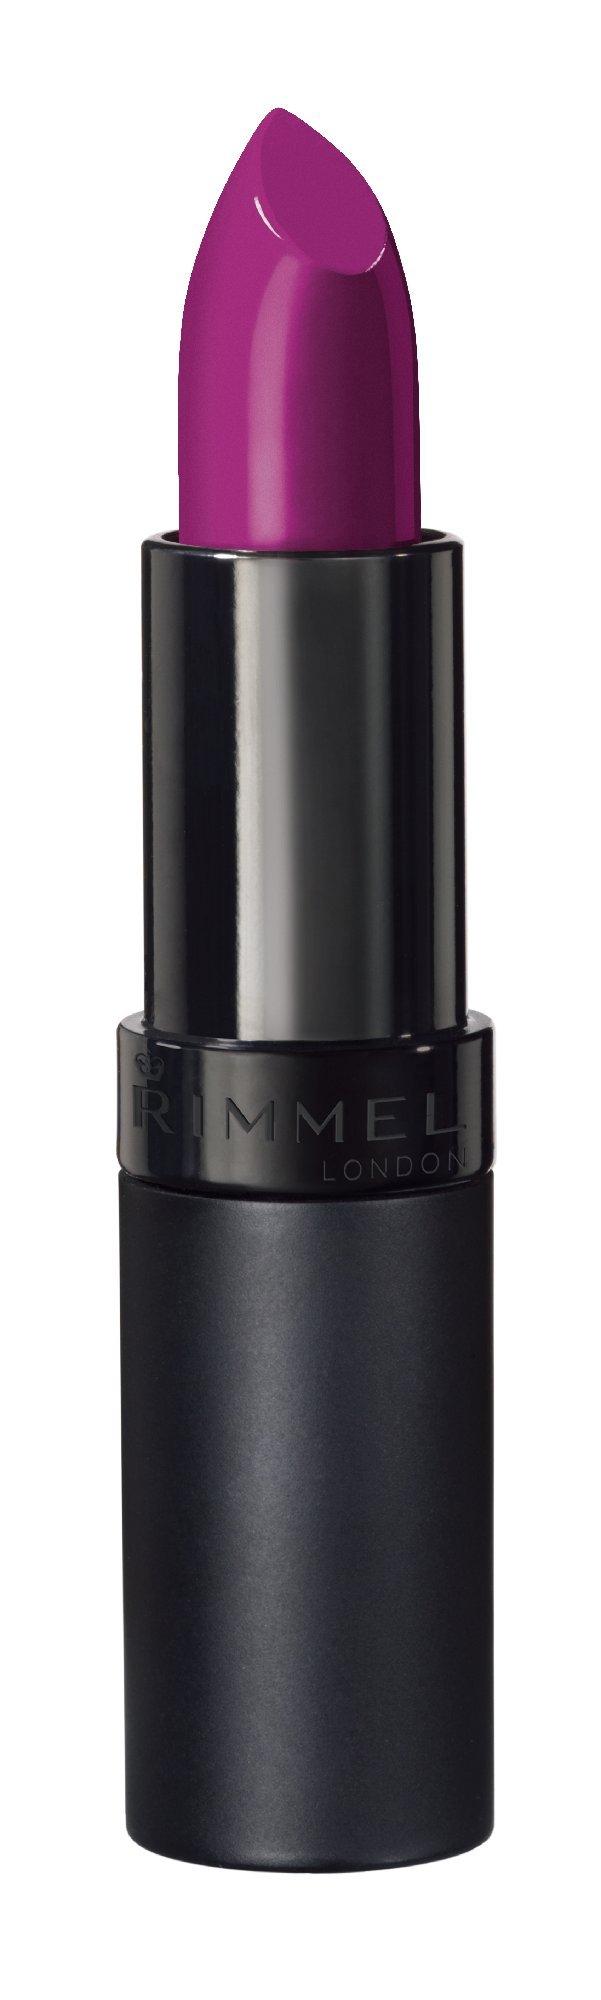 Rimmel Lasting Finish Lip Color by Kate Original, 029, 0.14 Fluid Ounce